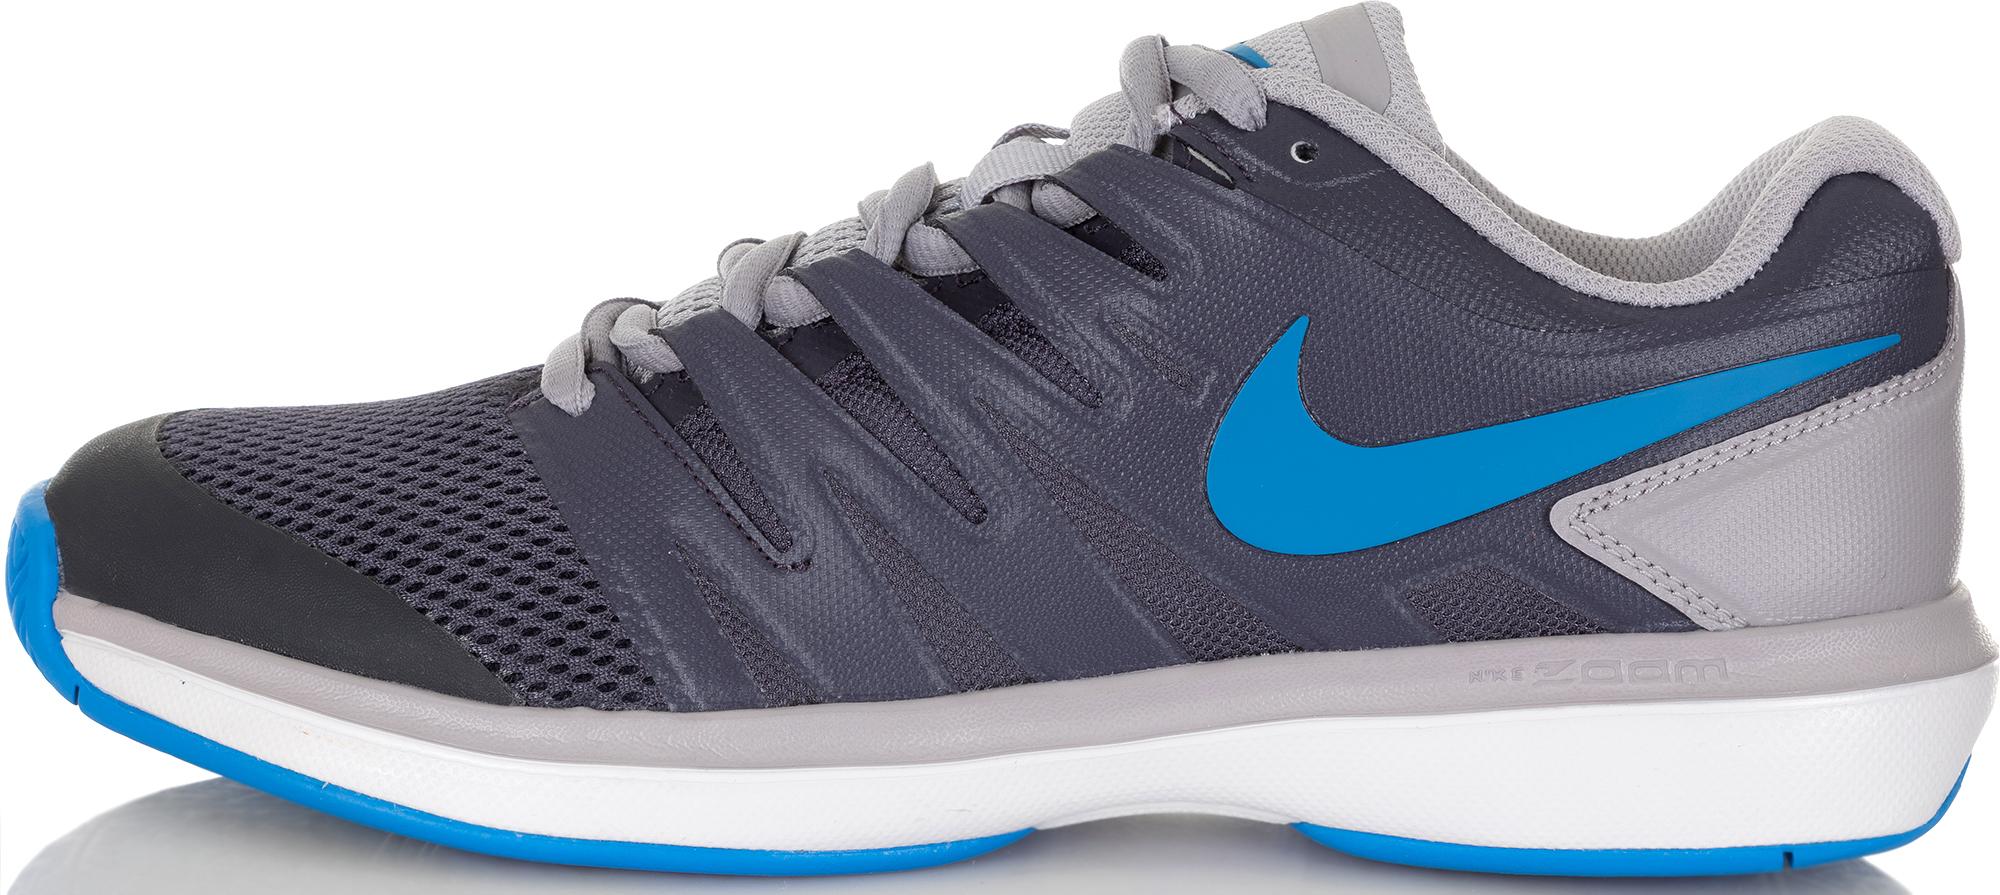 Nike Кроссовки мужские Nike Air Zoom Prestige, размер 46,5 цены онлайн